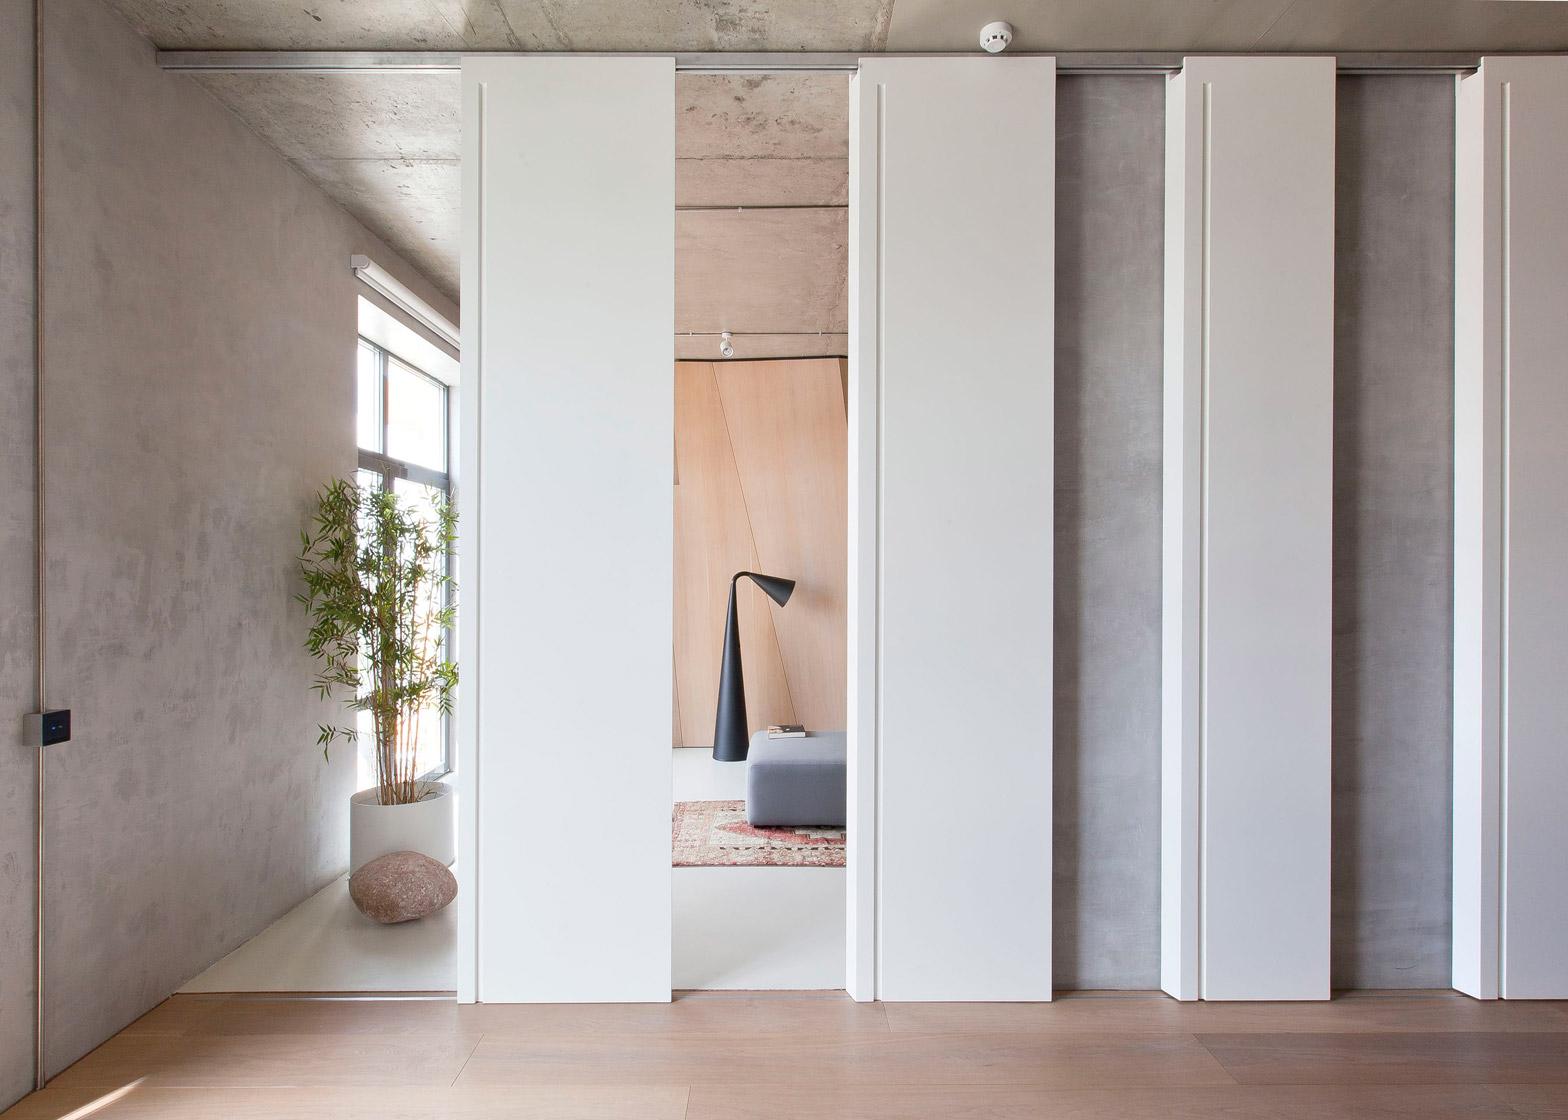 Appartamento a mosca in stile giapponese by m17 studio arc art blog by daniele drigo - Bagno stile giapponese ...